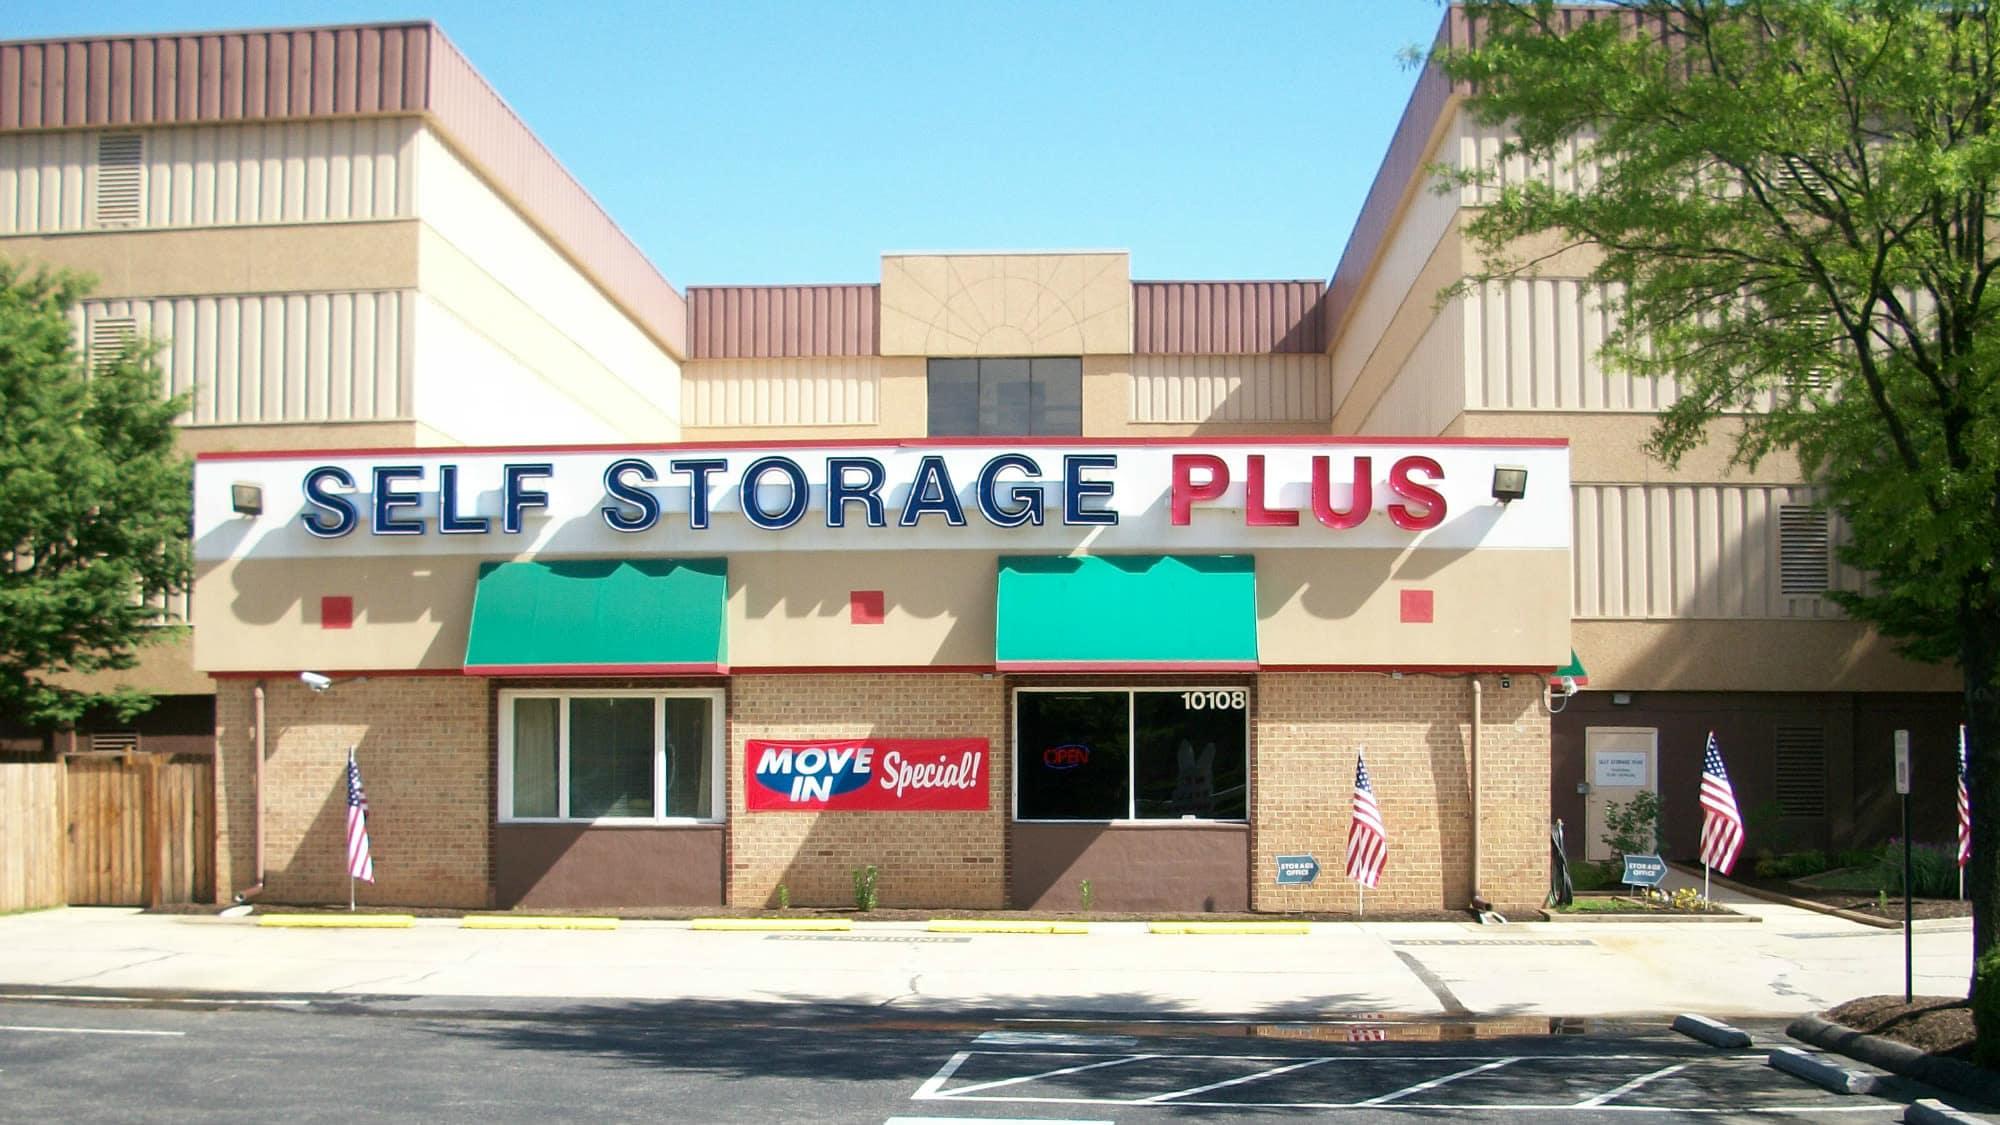 Front of Self Storage Plus in Lanham, MD